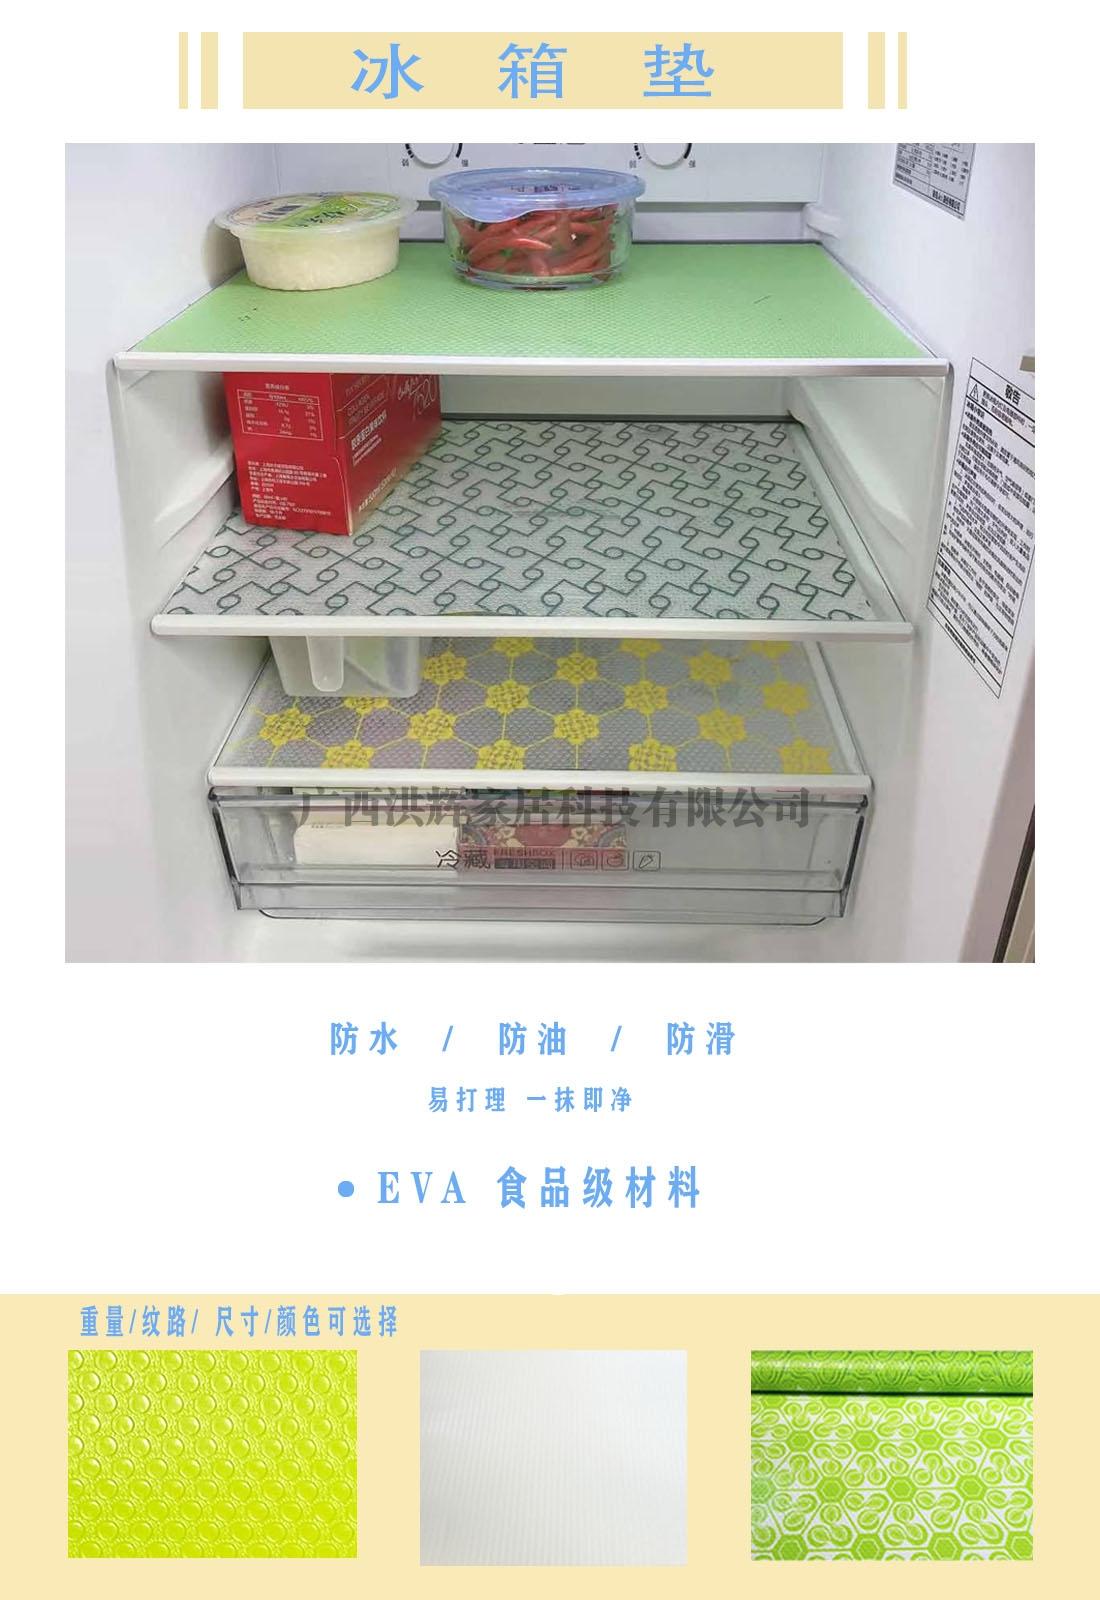 EVA冰箱垫